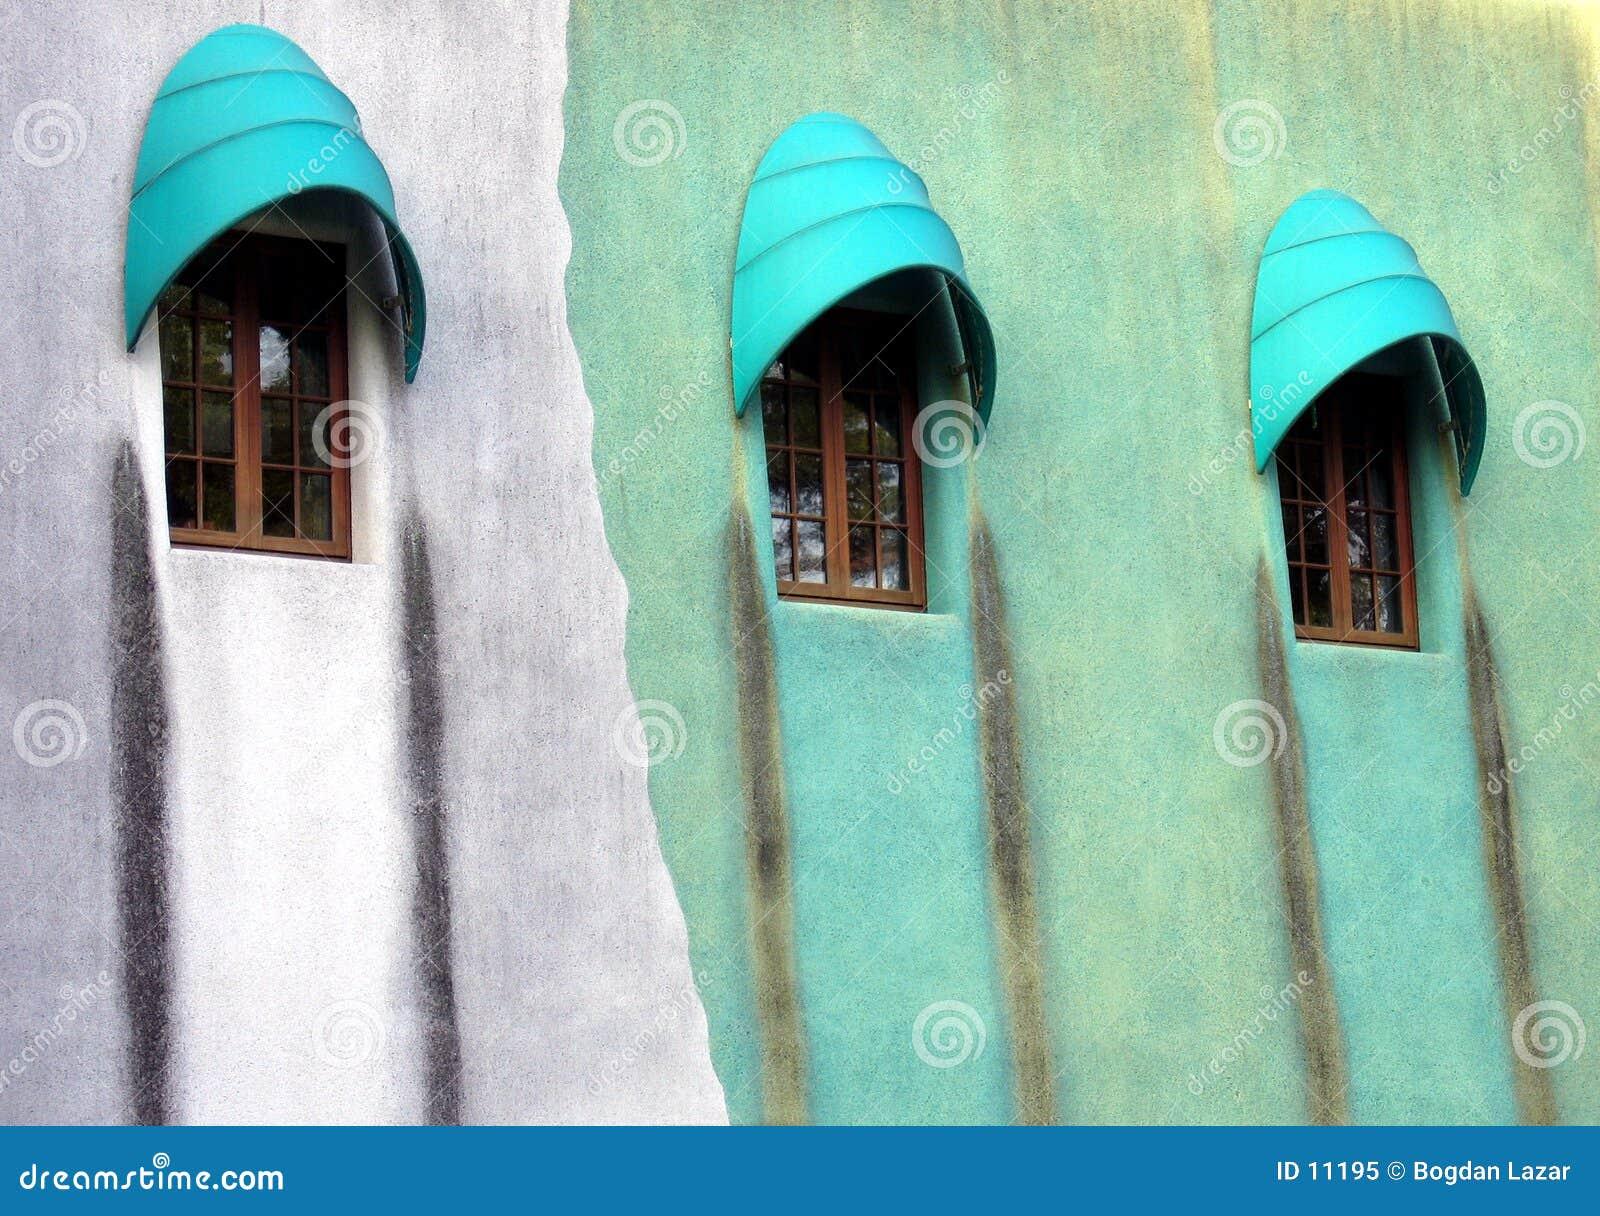 Strange window design